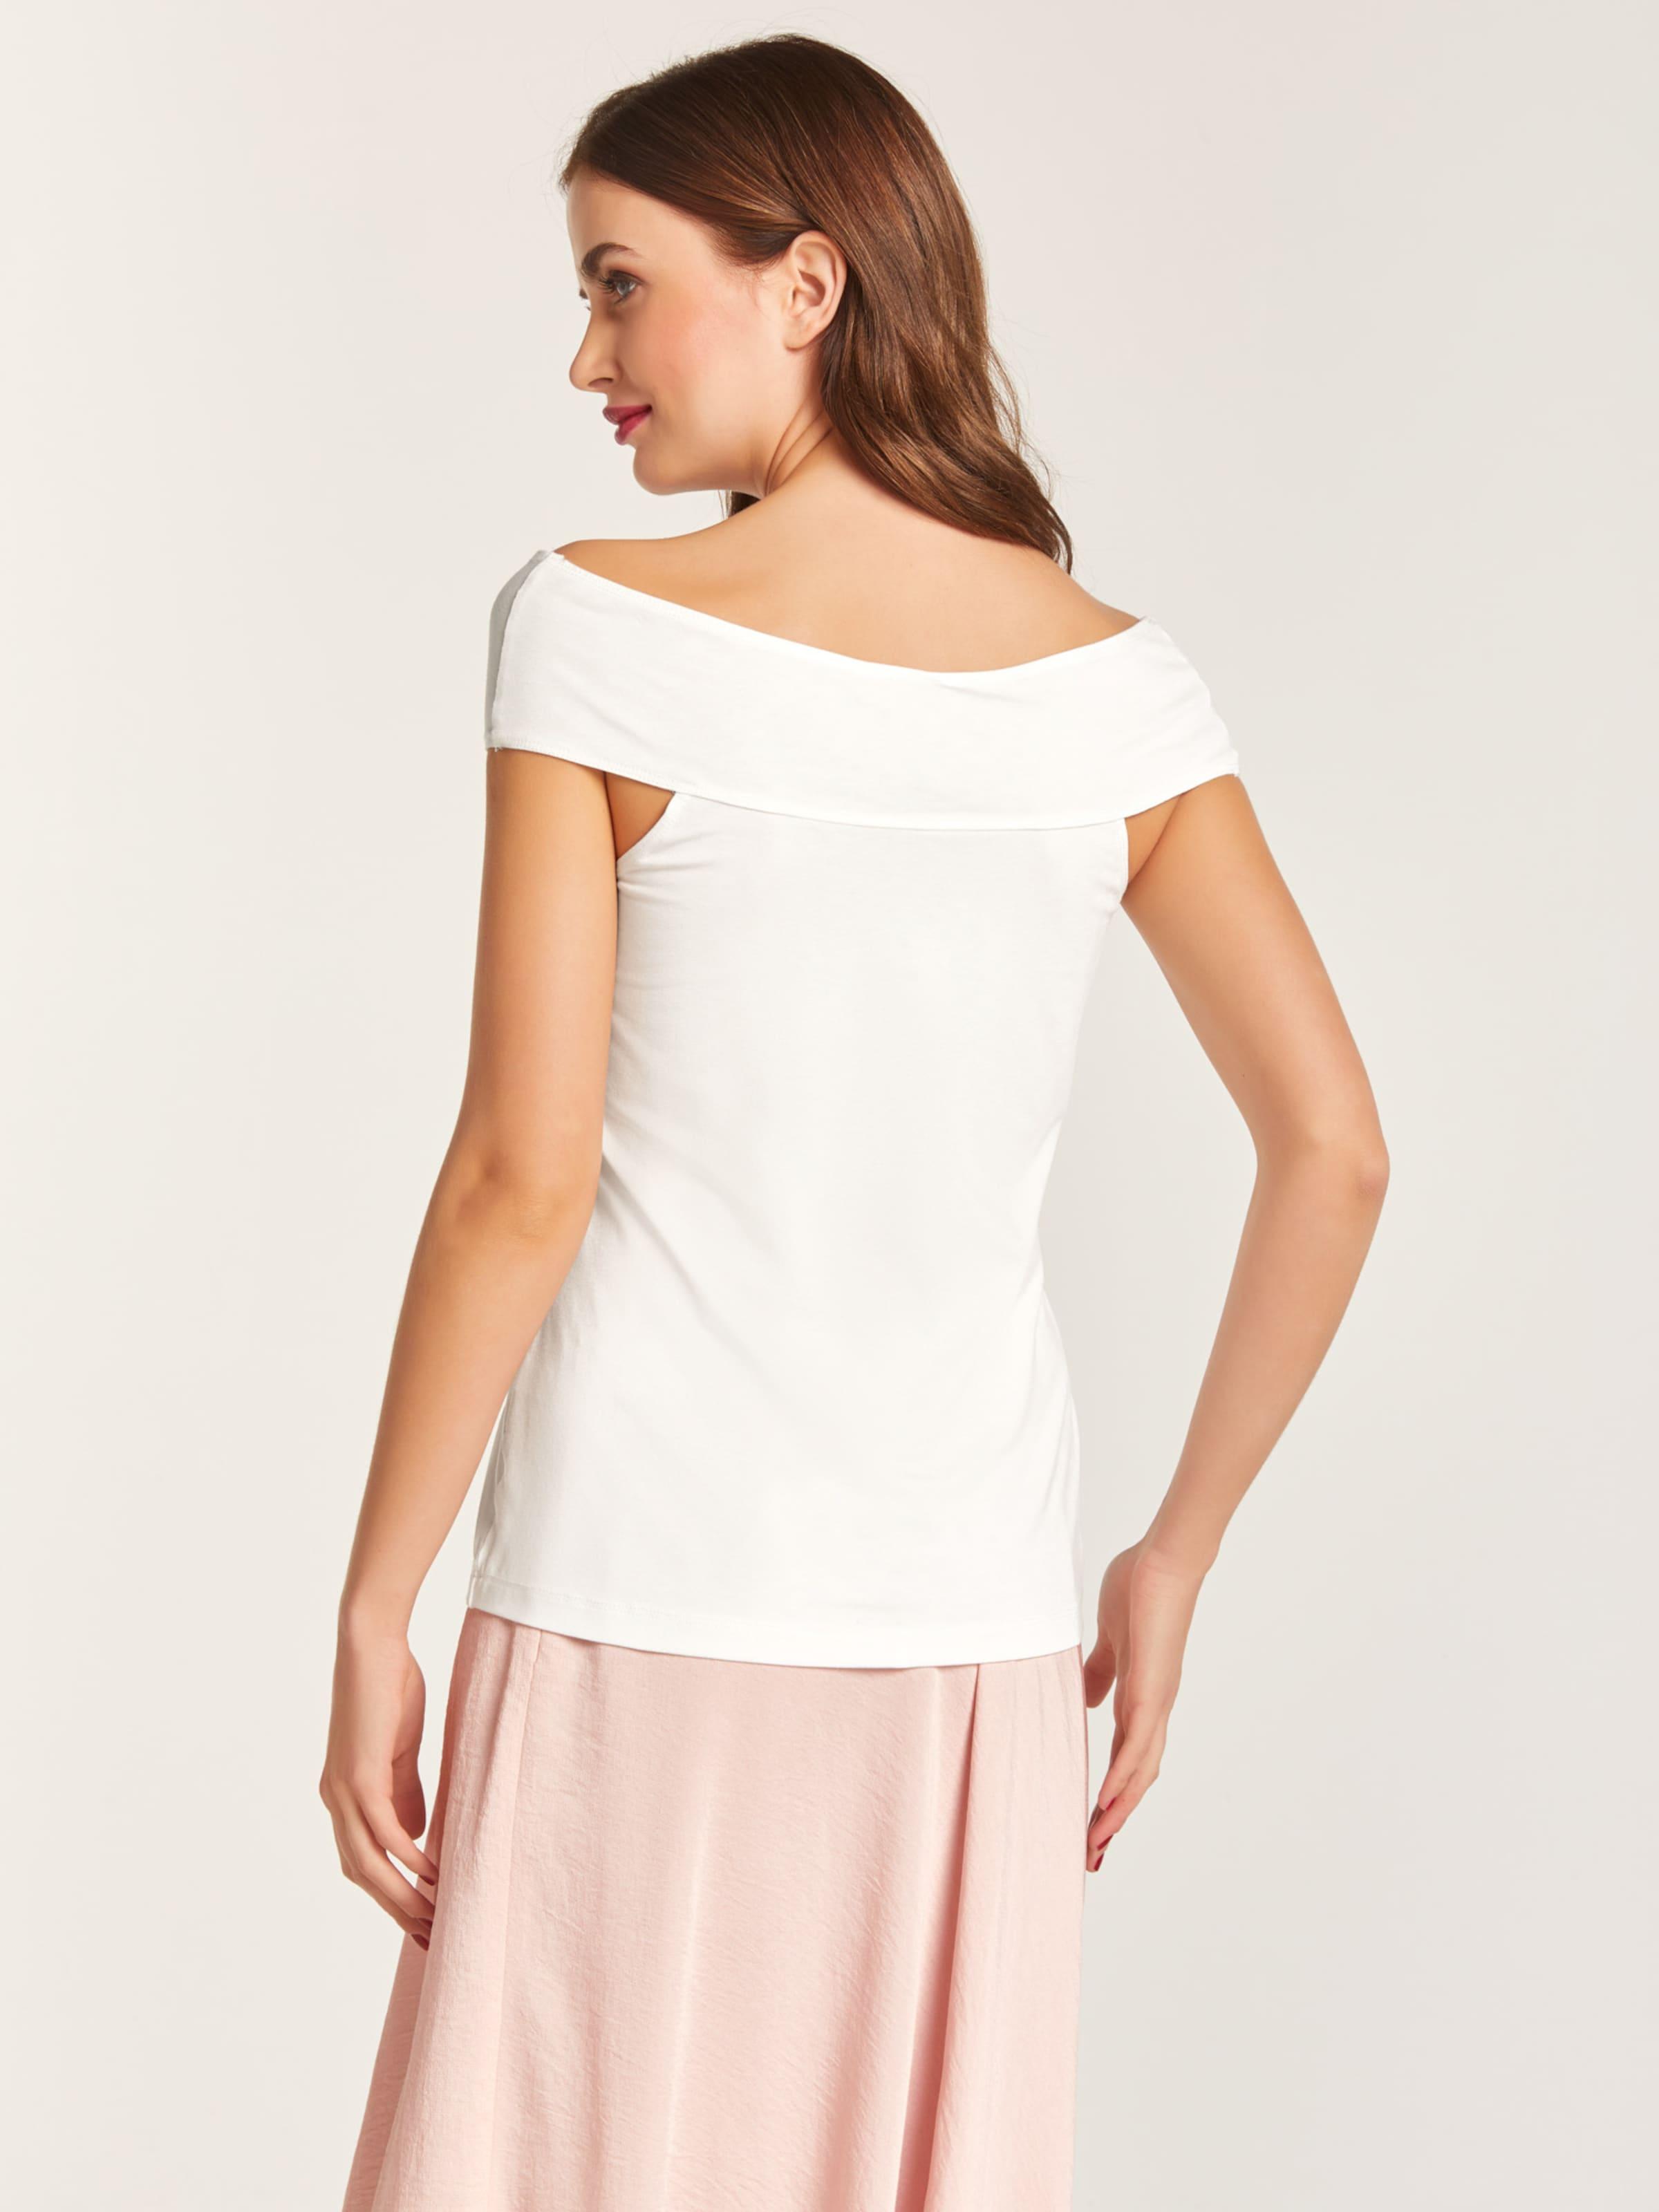 Nw80vmno In In Offwhite Shirt Heine Wltxzuopki